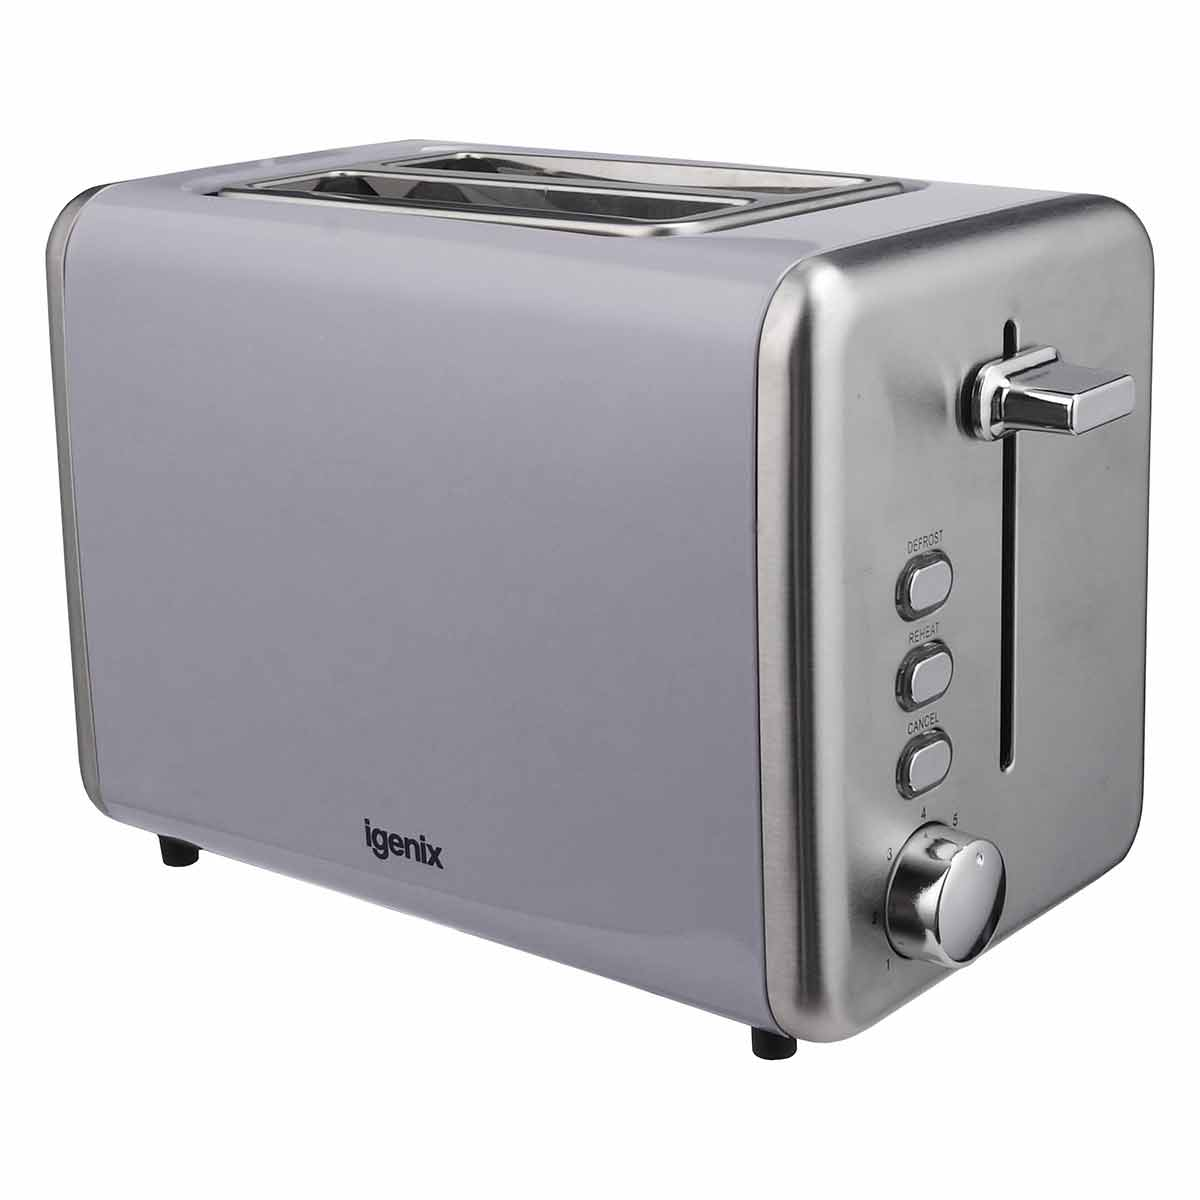 Igenix 2 Slice Toaster with Stainless Steel, Grey